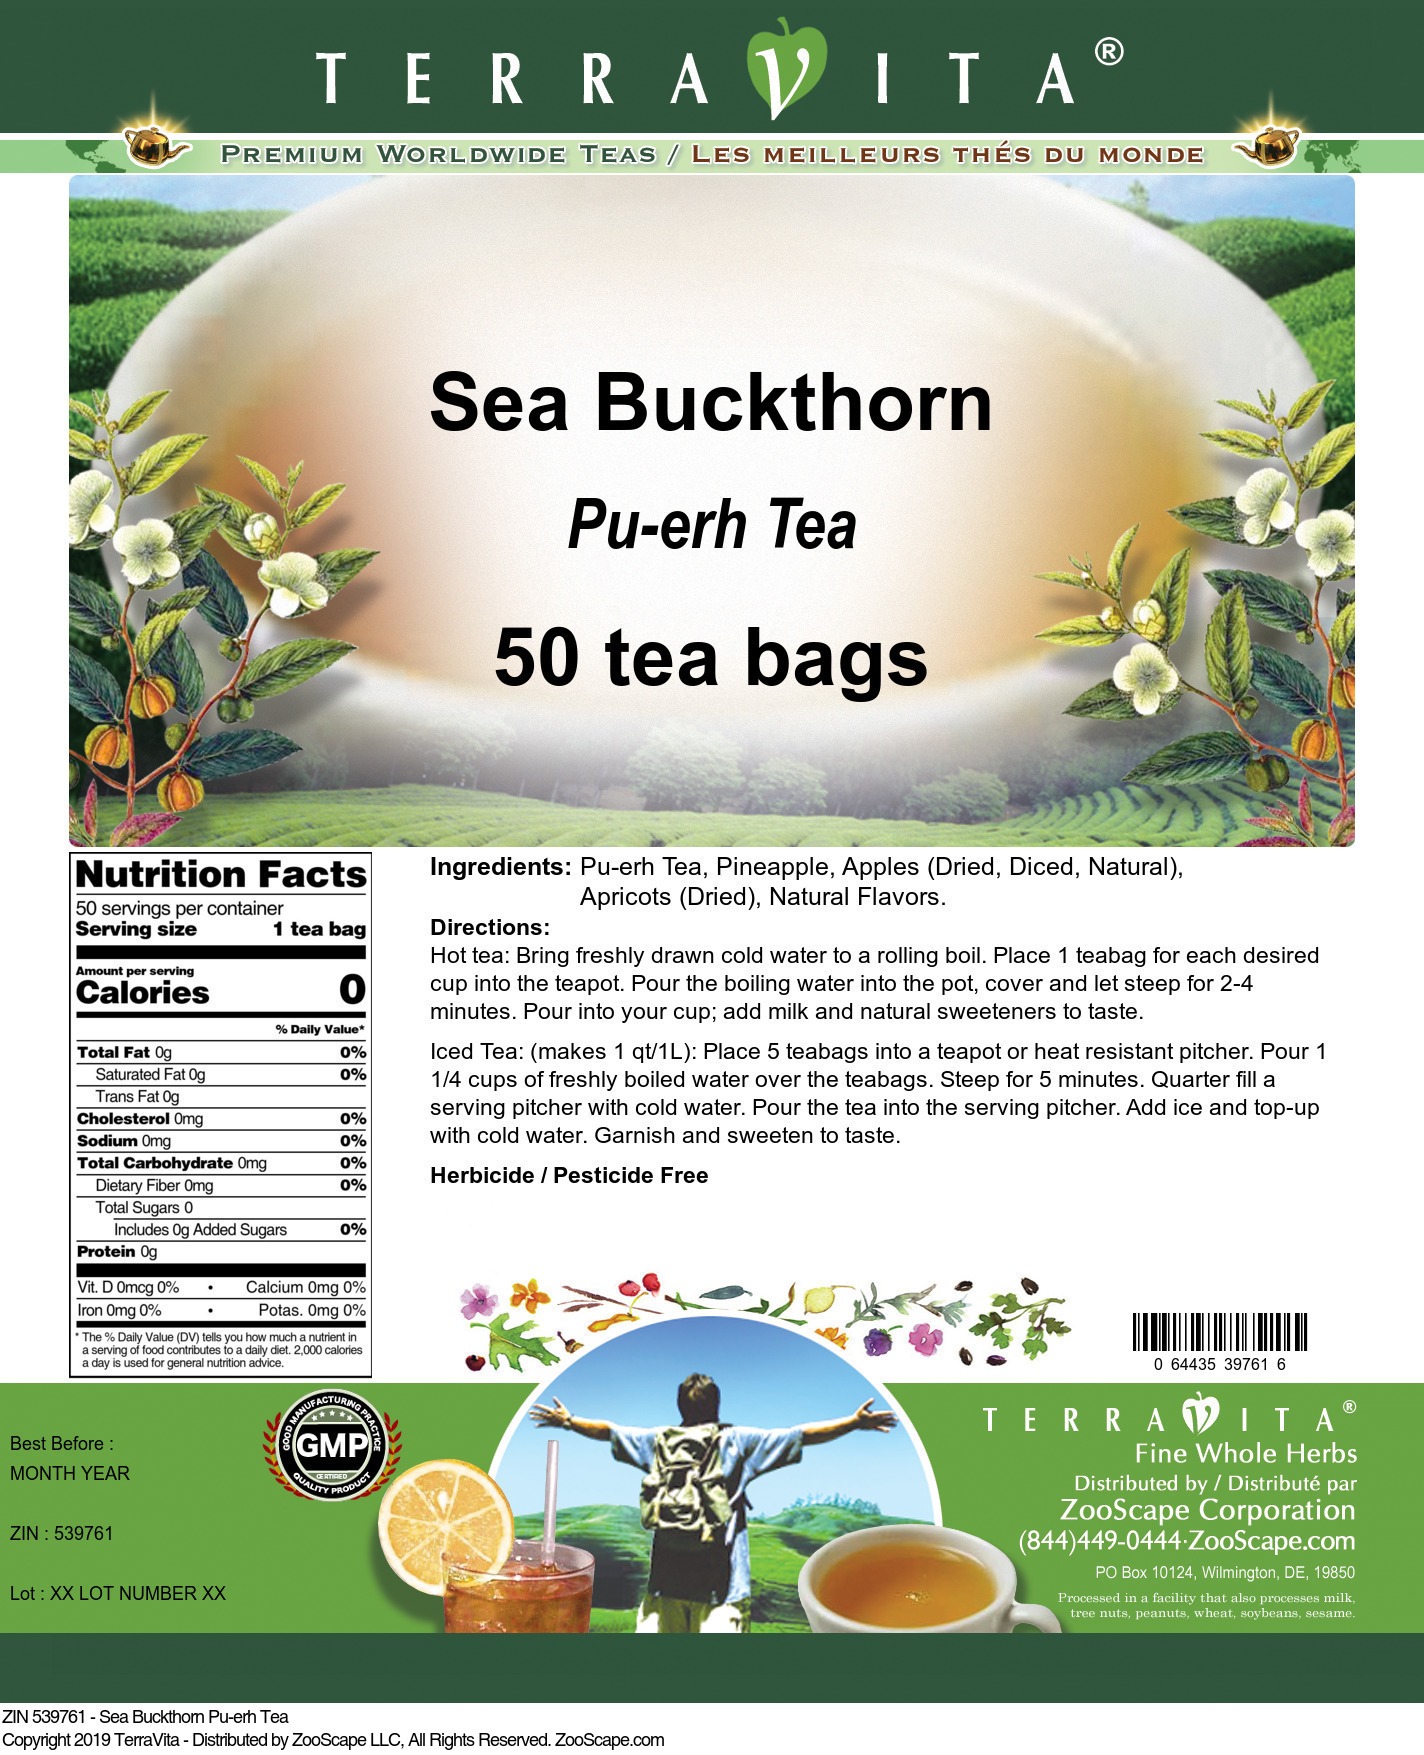 Sea Buckthorn Pu-erh Tea